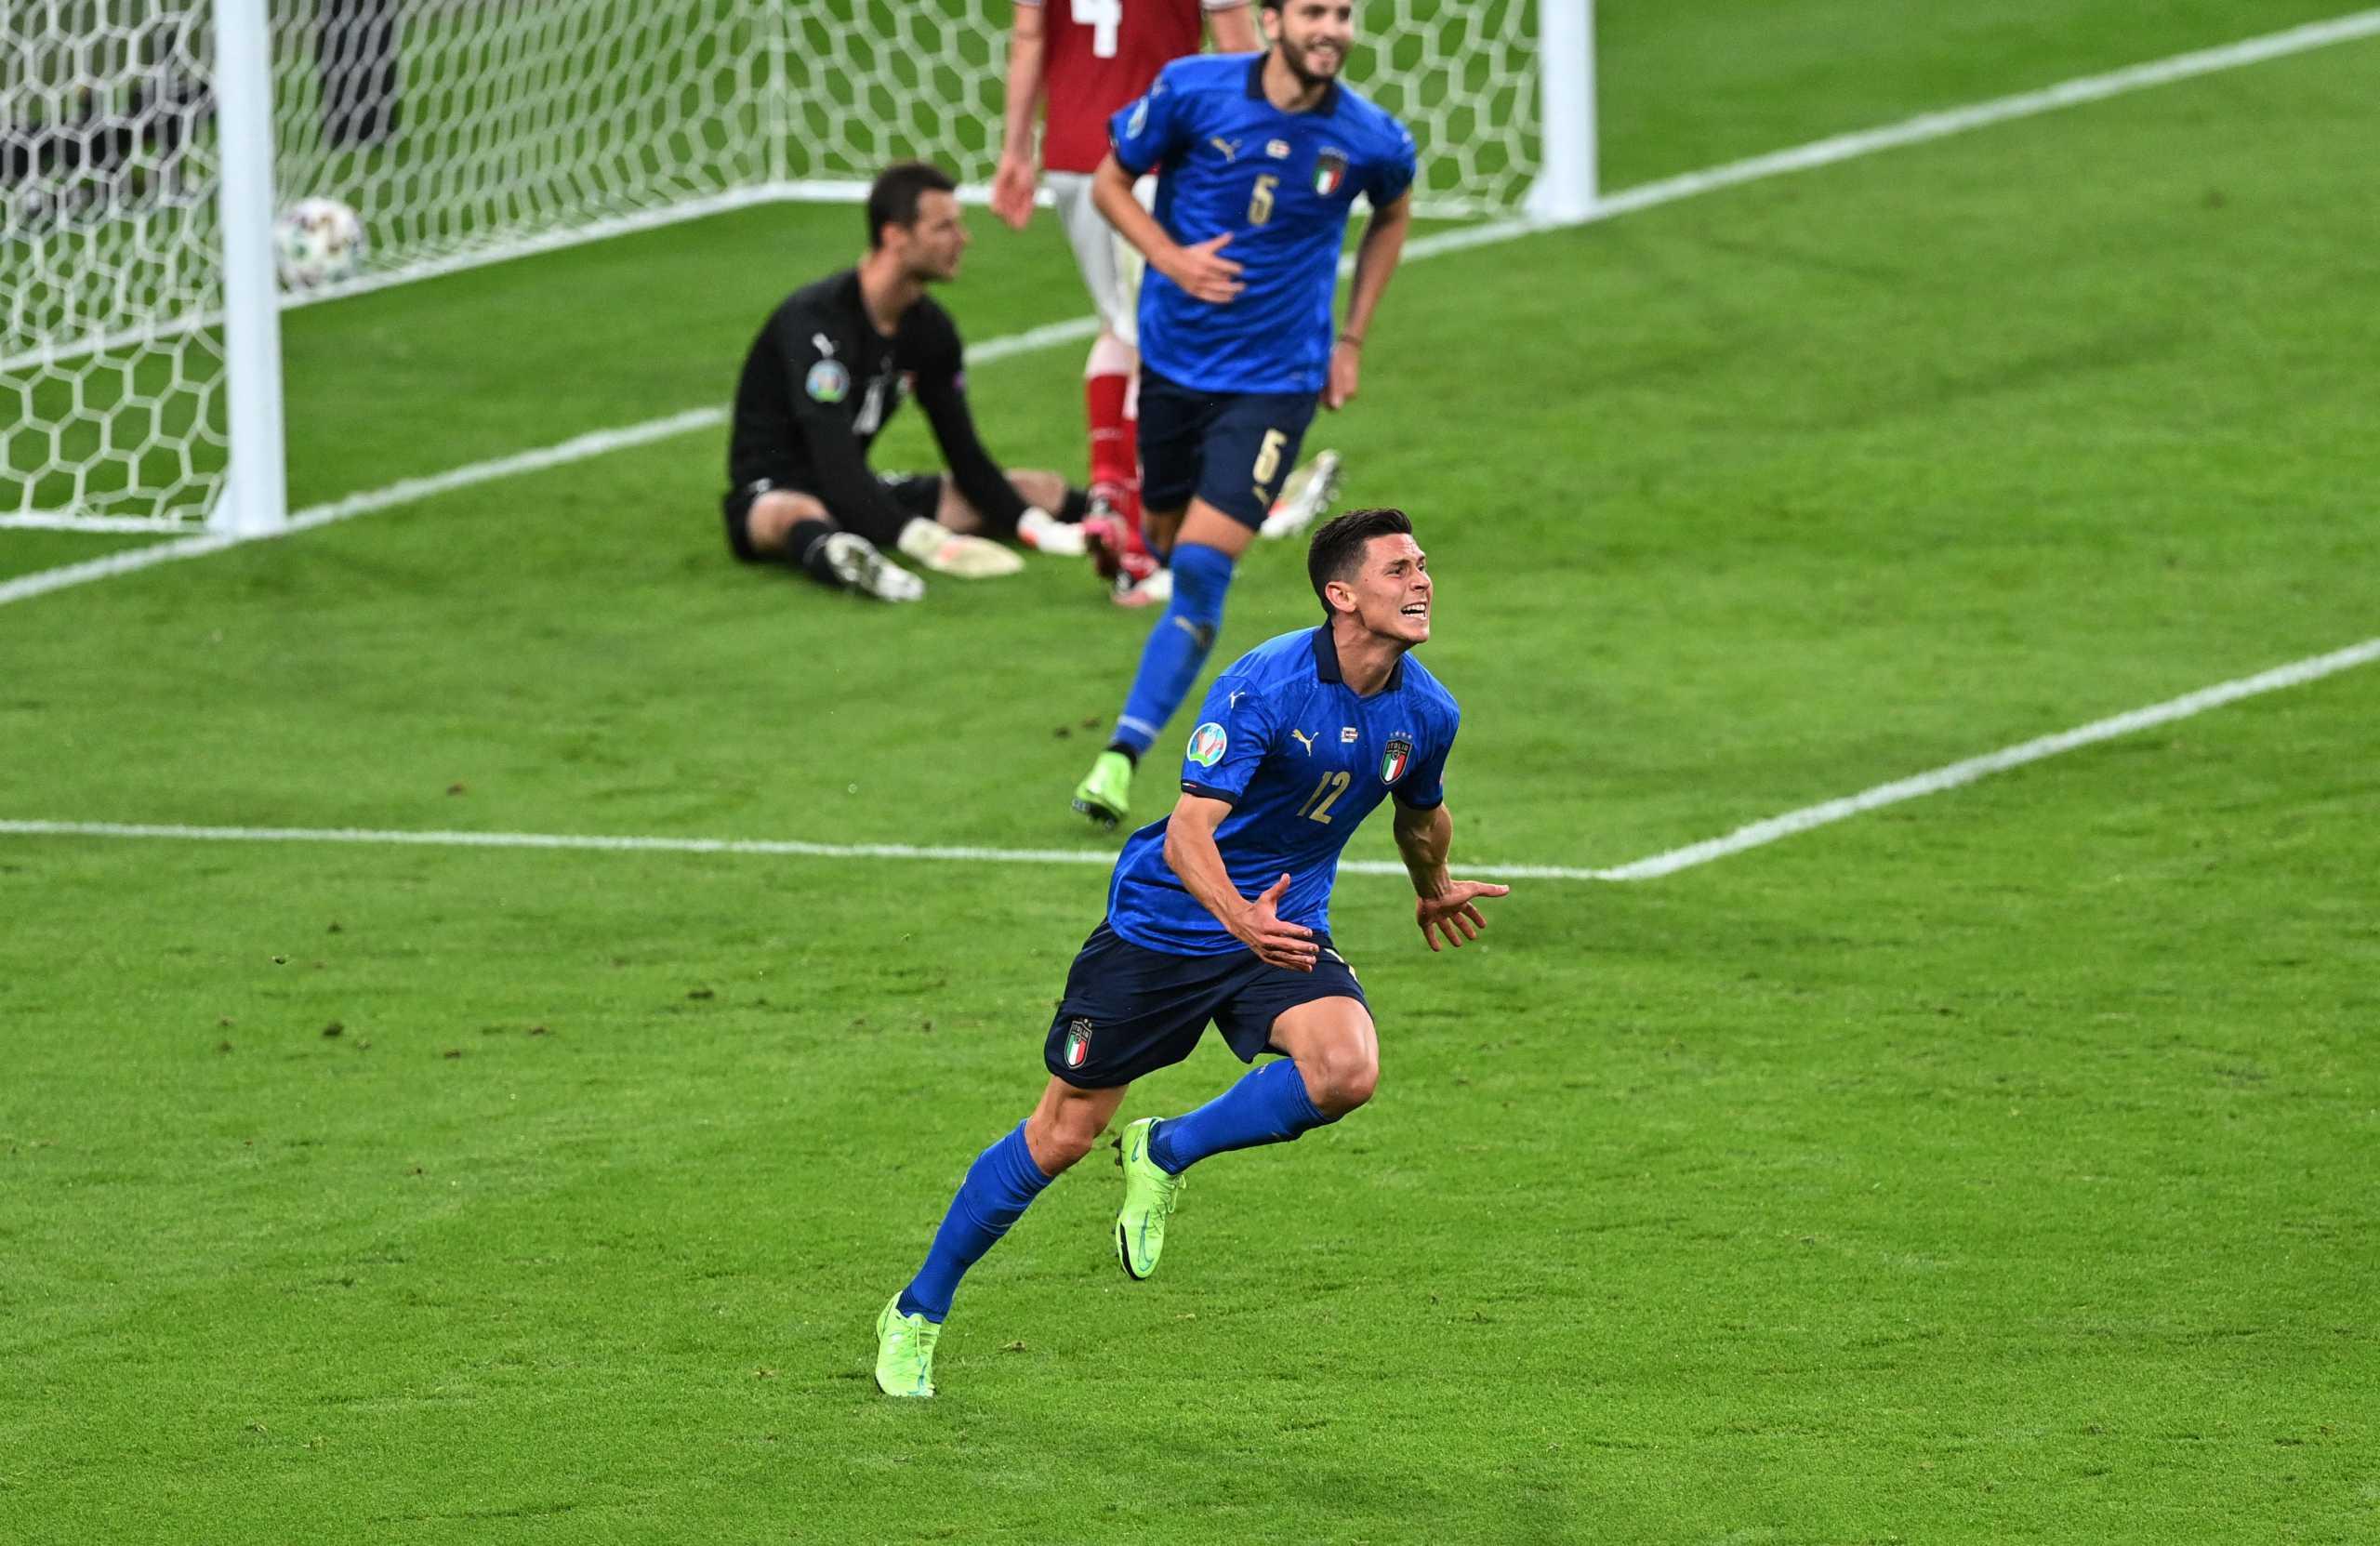 Euro 2020, Ιταλία – Αυστρία 0-0 (2-1 παρ.): Στους «8» παρά τα «ζόρια» η «σκουάντρα ατζούρα»